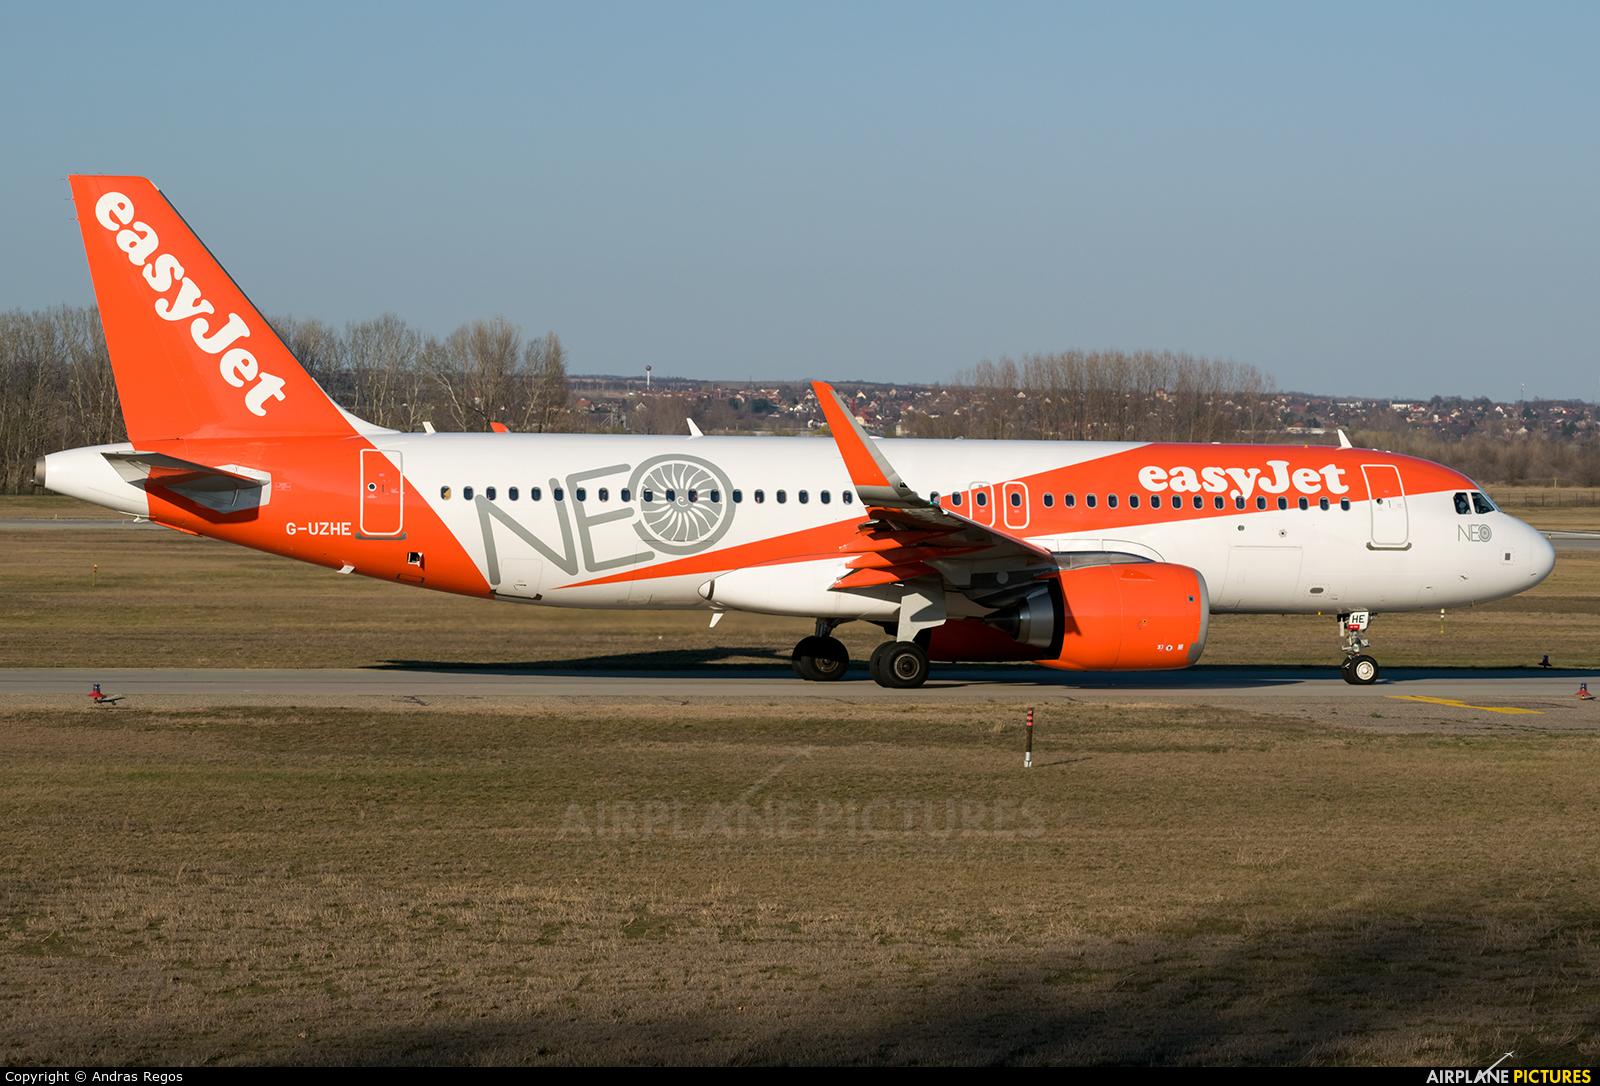 easyJet G-UZHE aircraft at Budapest Ferenc Liszt International Airport